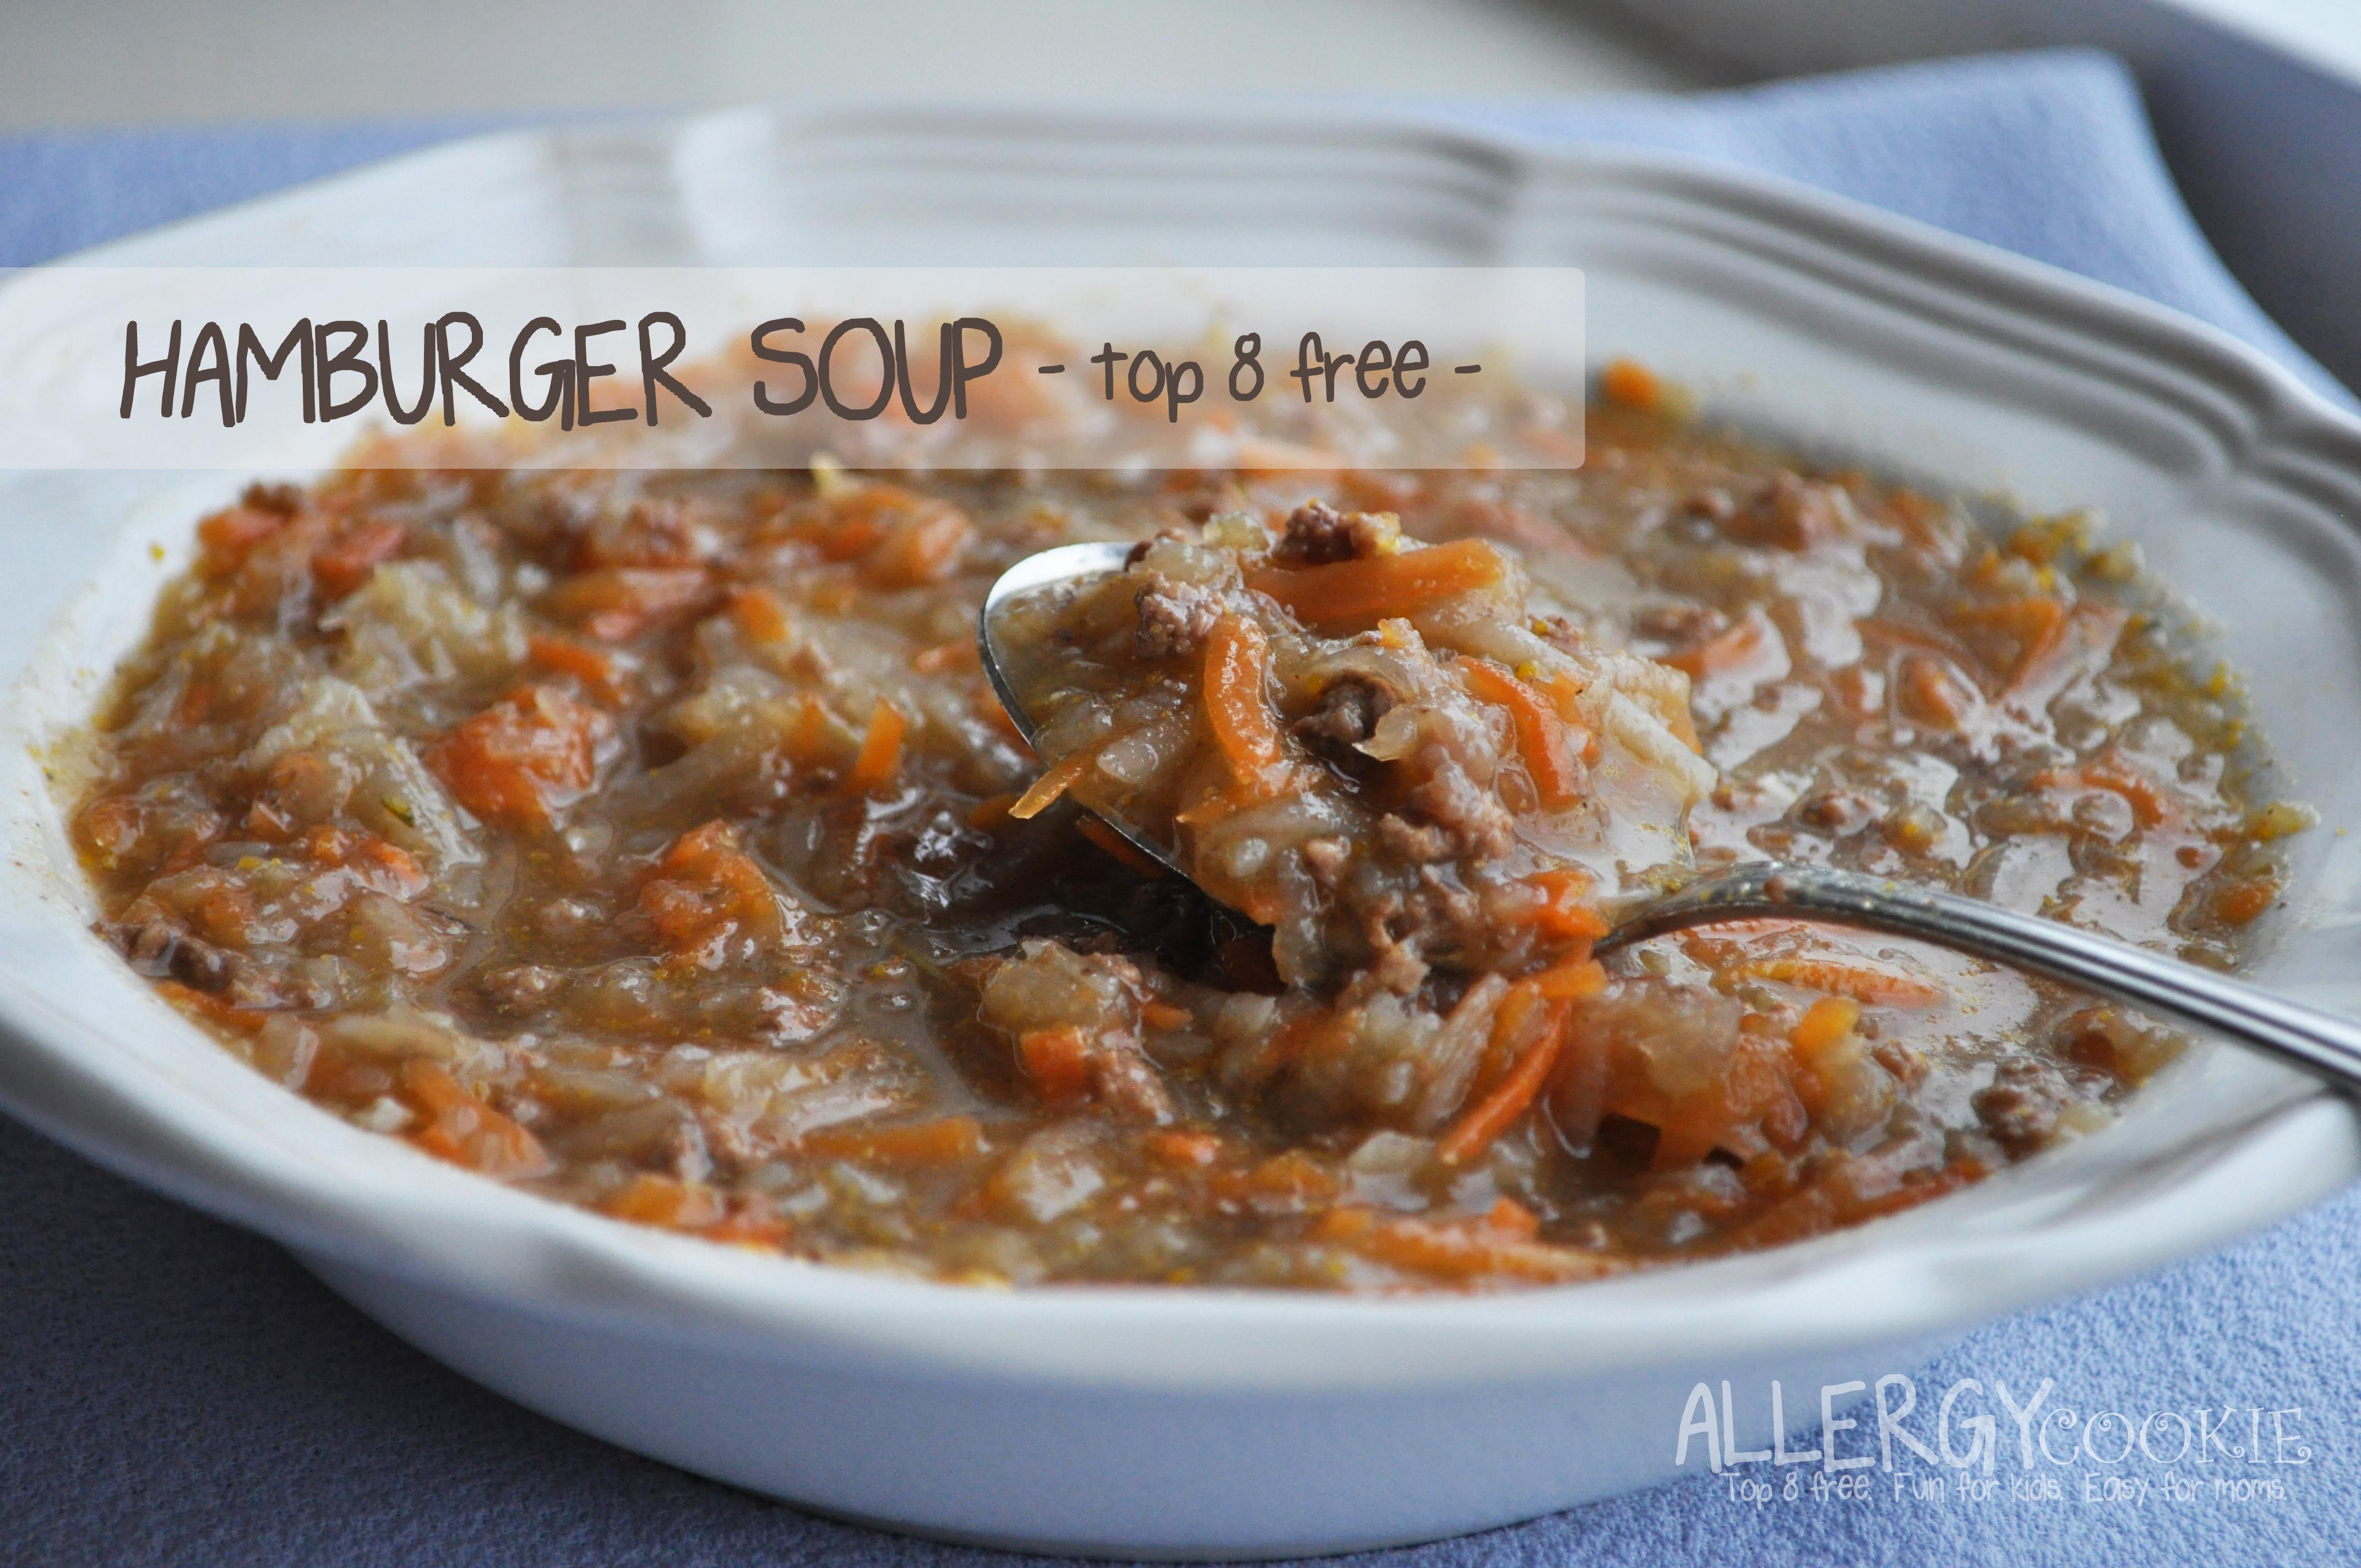 Savory Hamburger Soup (gluten free, dairy free, top 8 free)